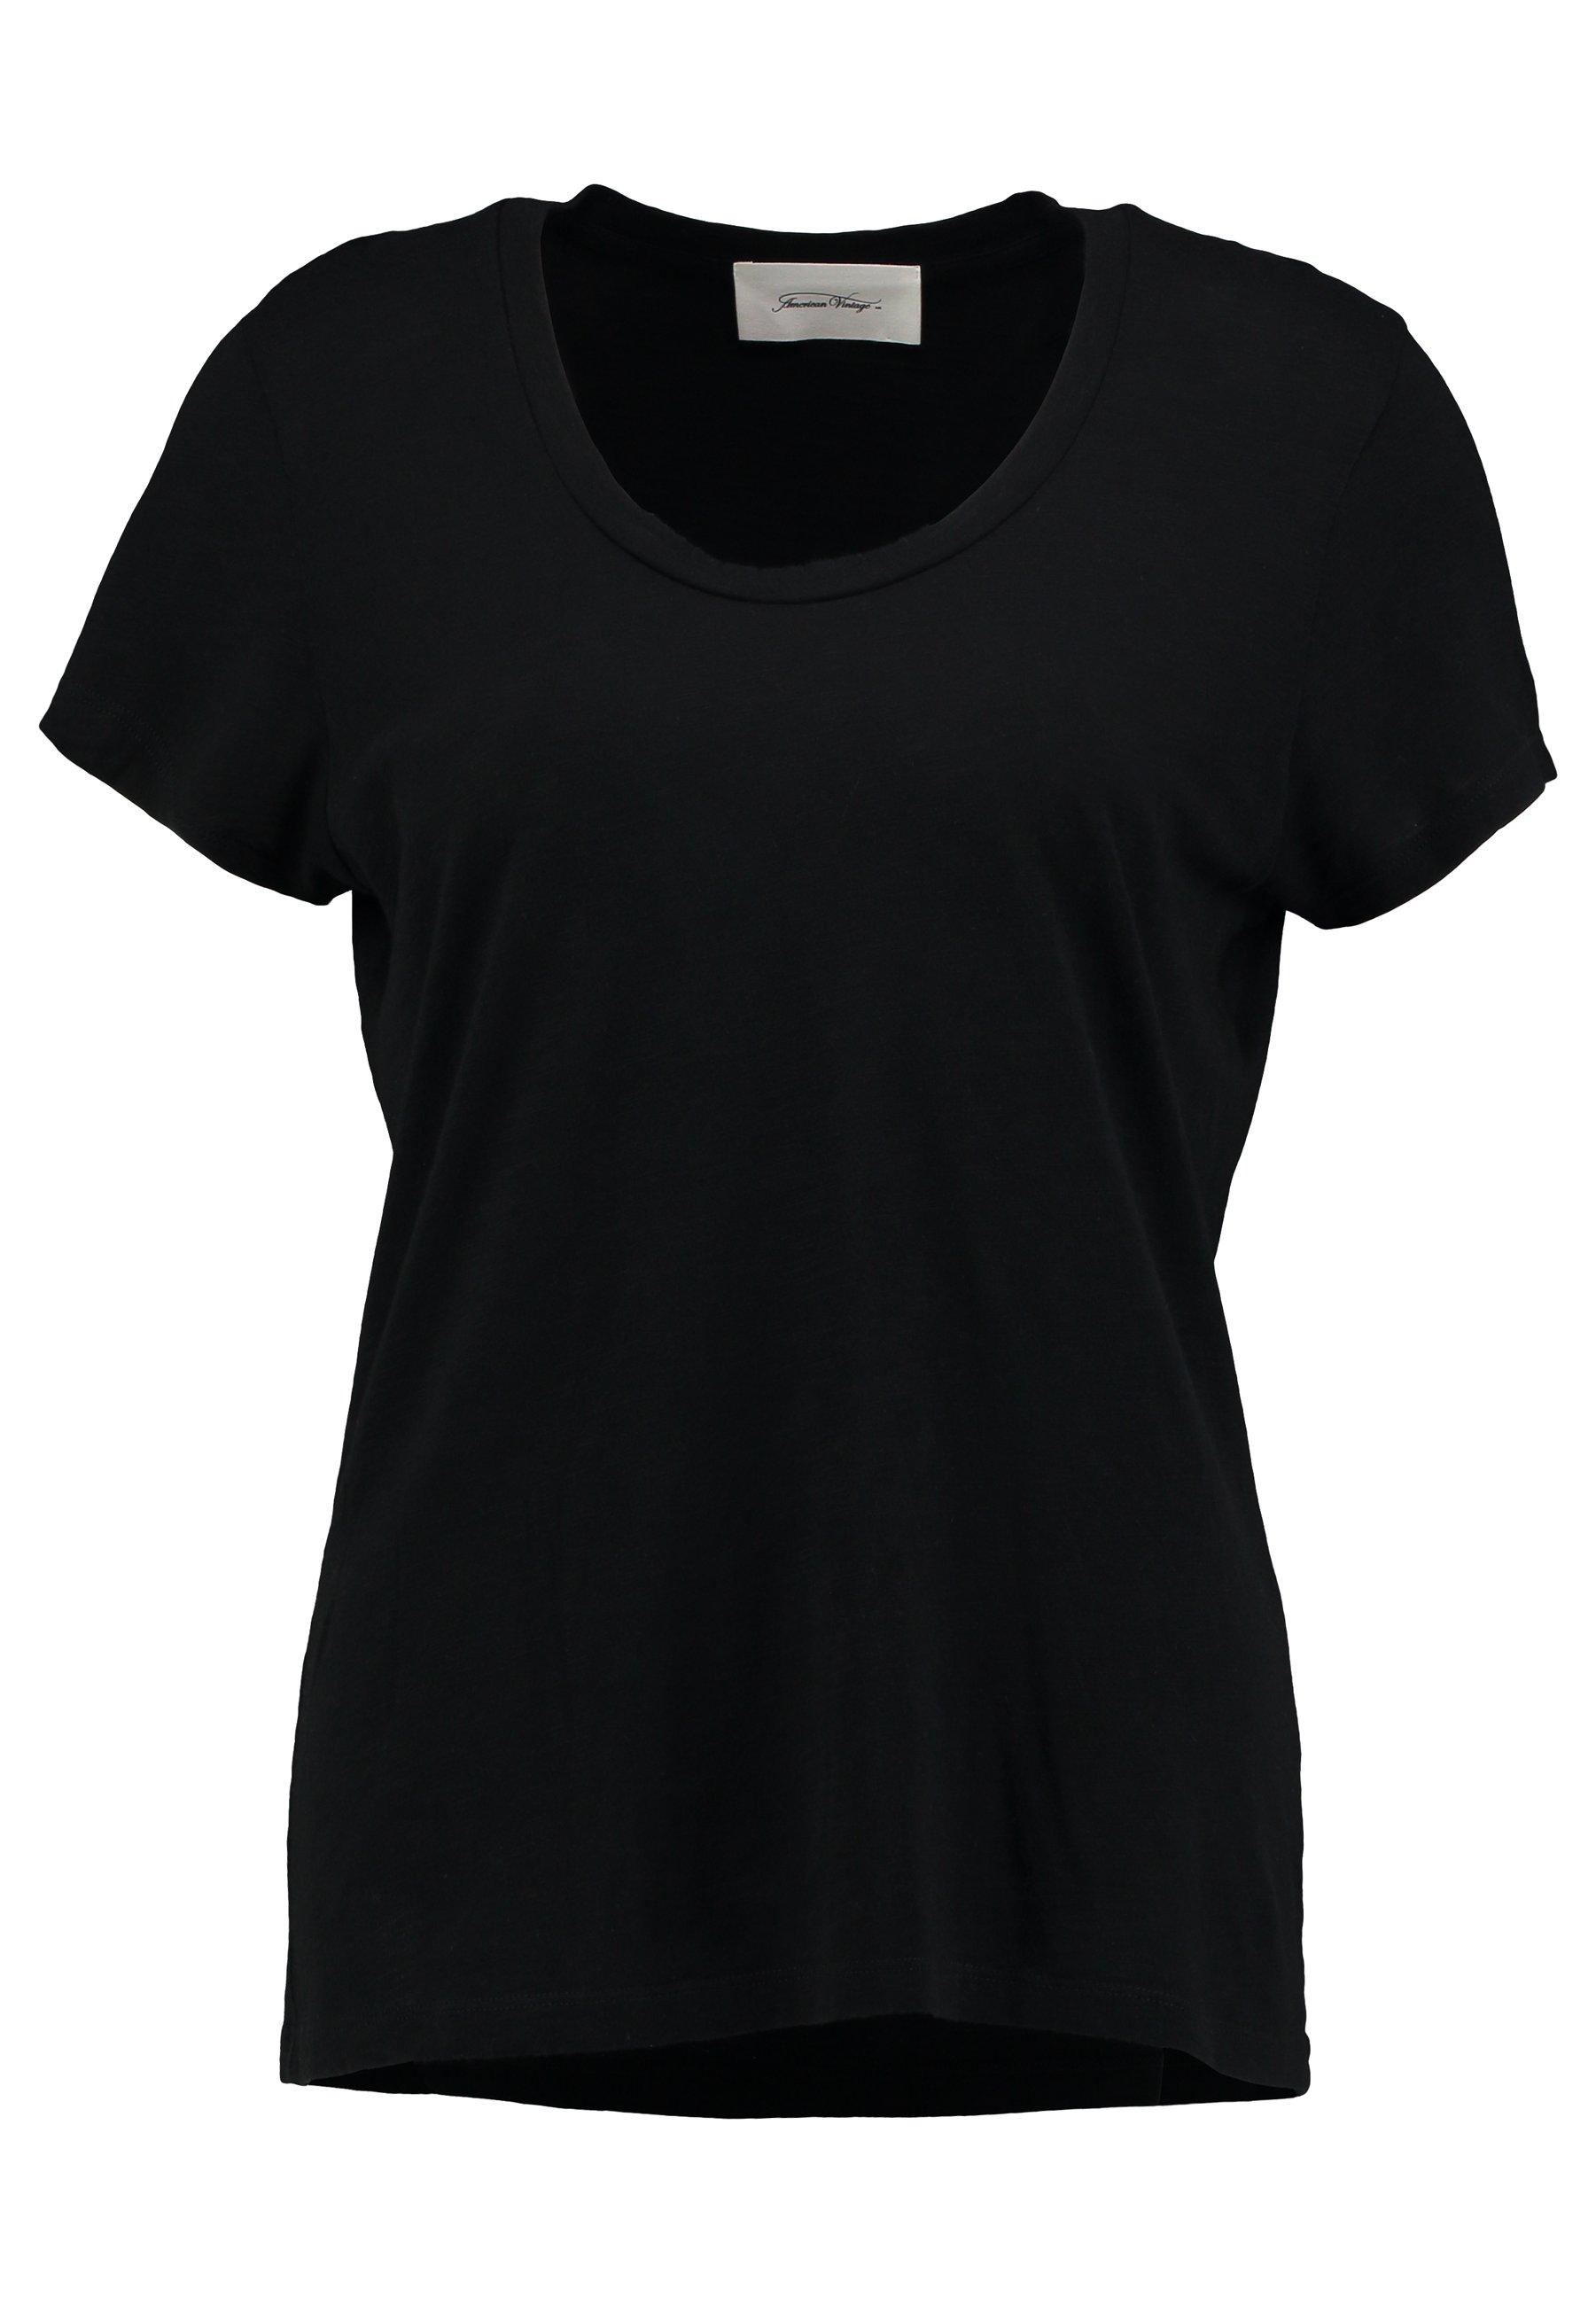 American Vintage JACKSONVILLE ROUND NECK - T-shirt basic - noir QNlRjYki